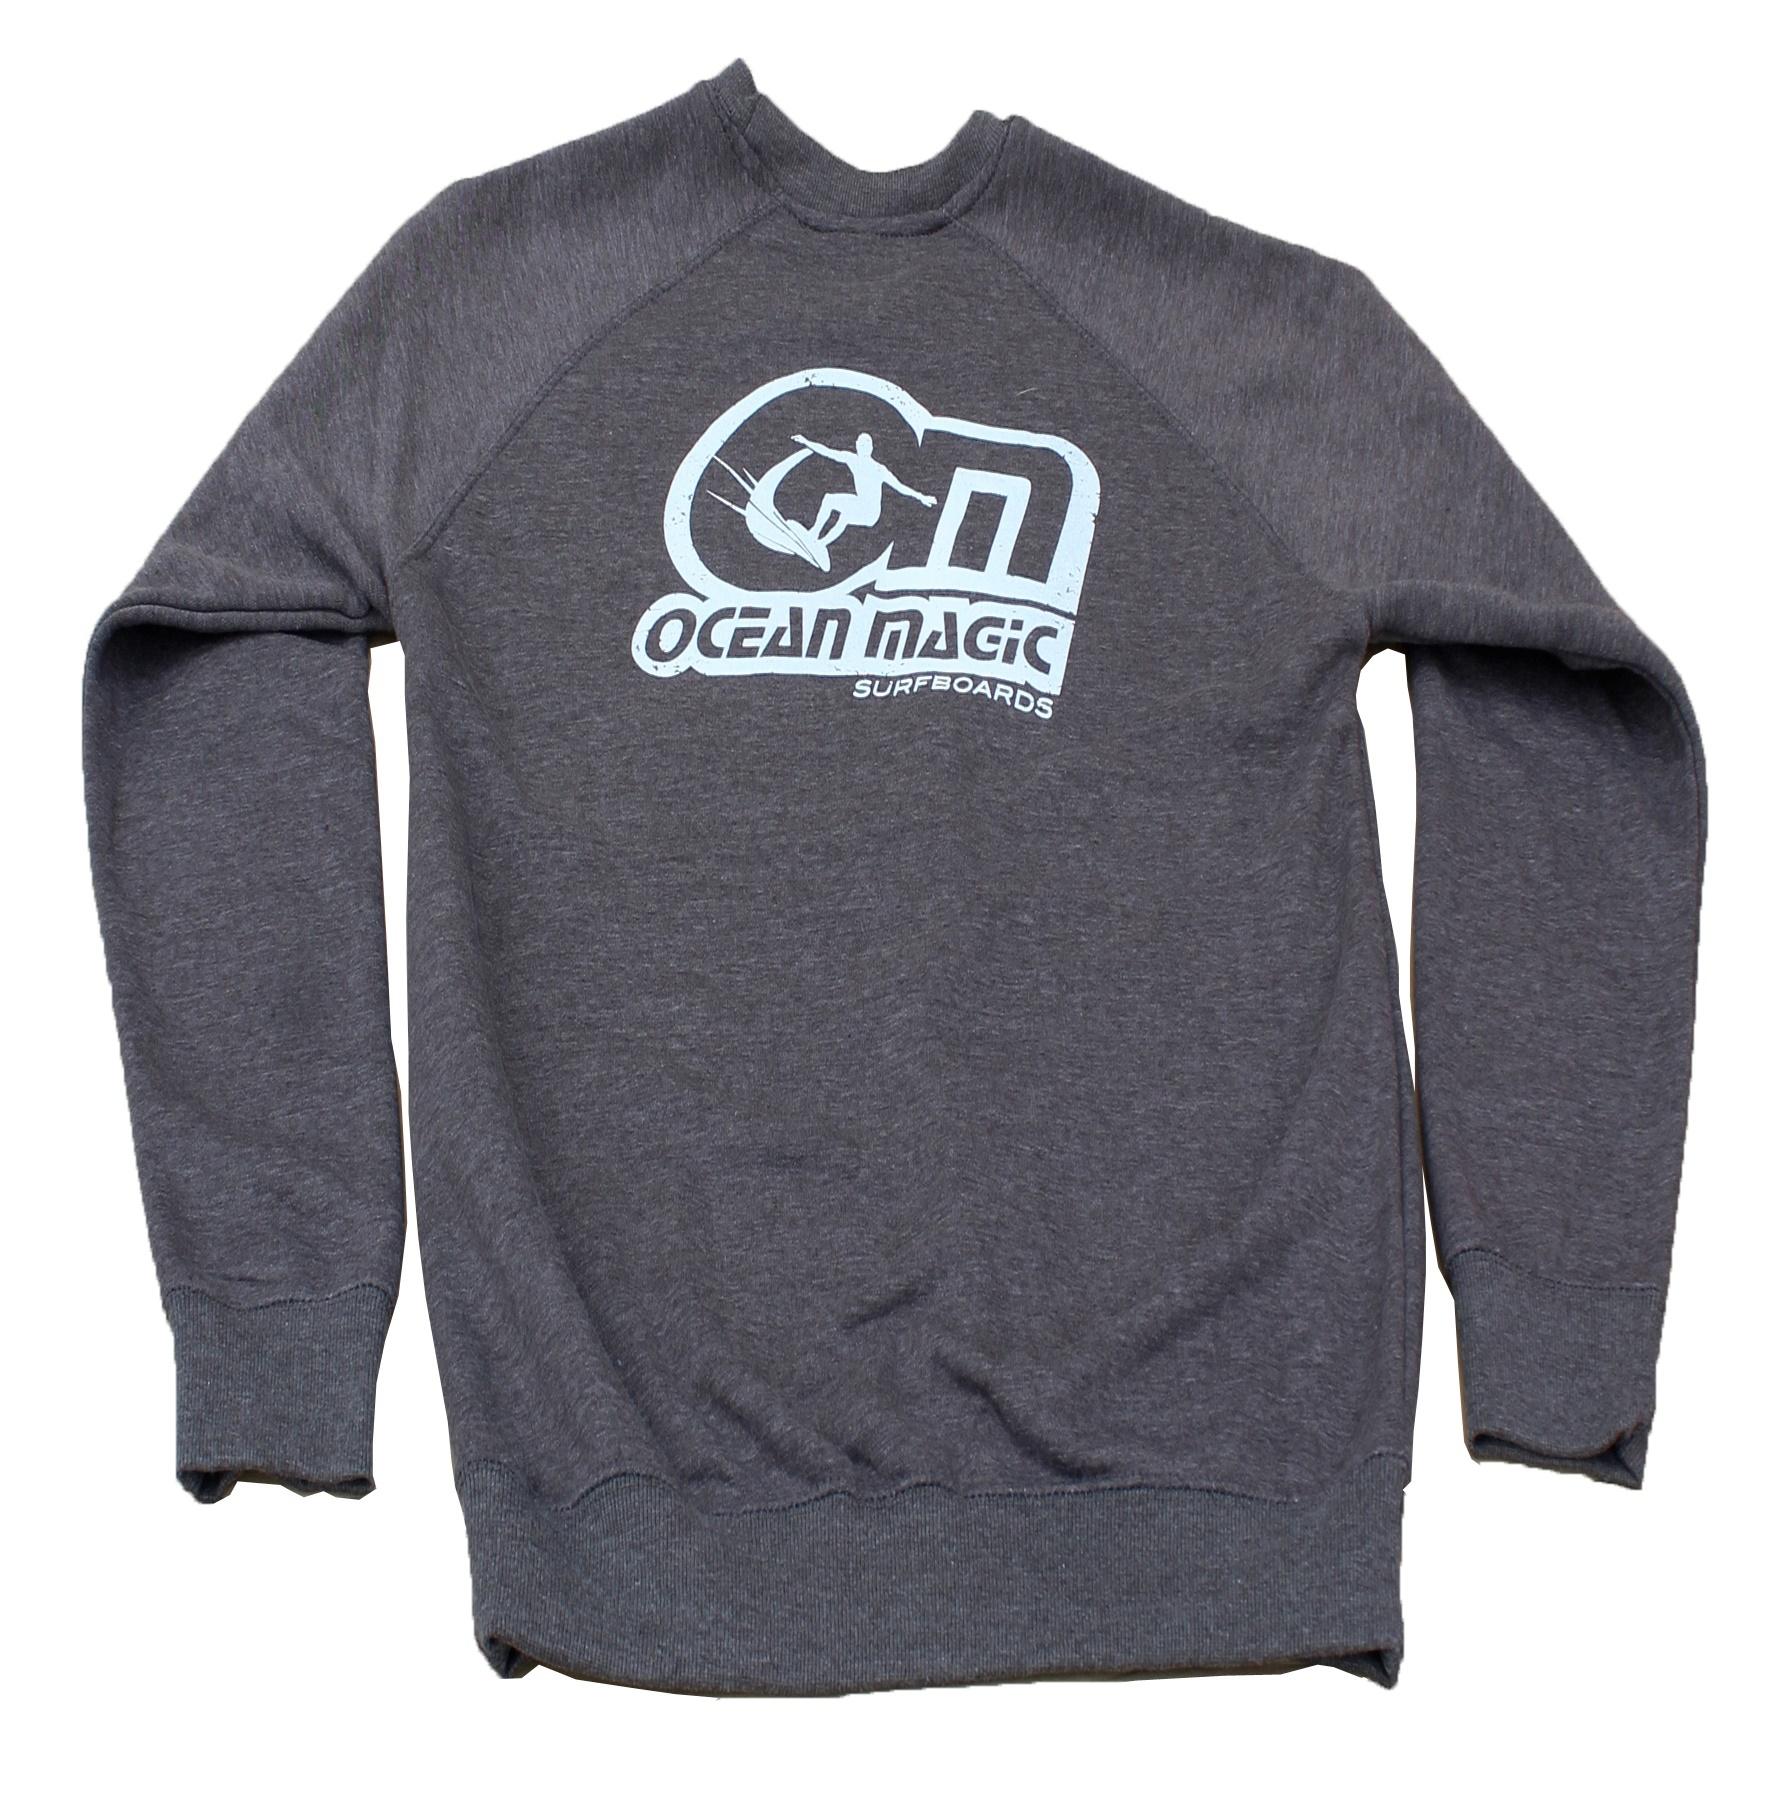 Picture of L/S Sweatshirt